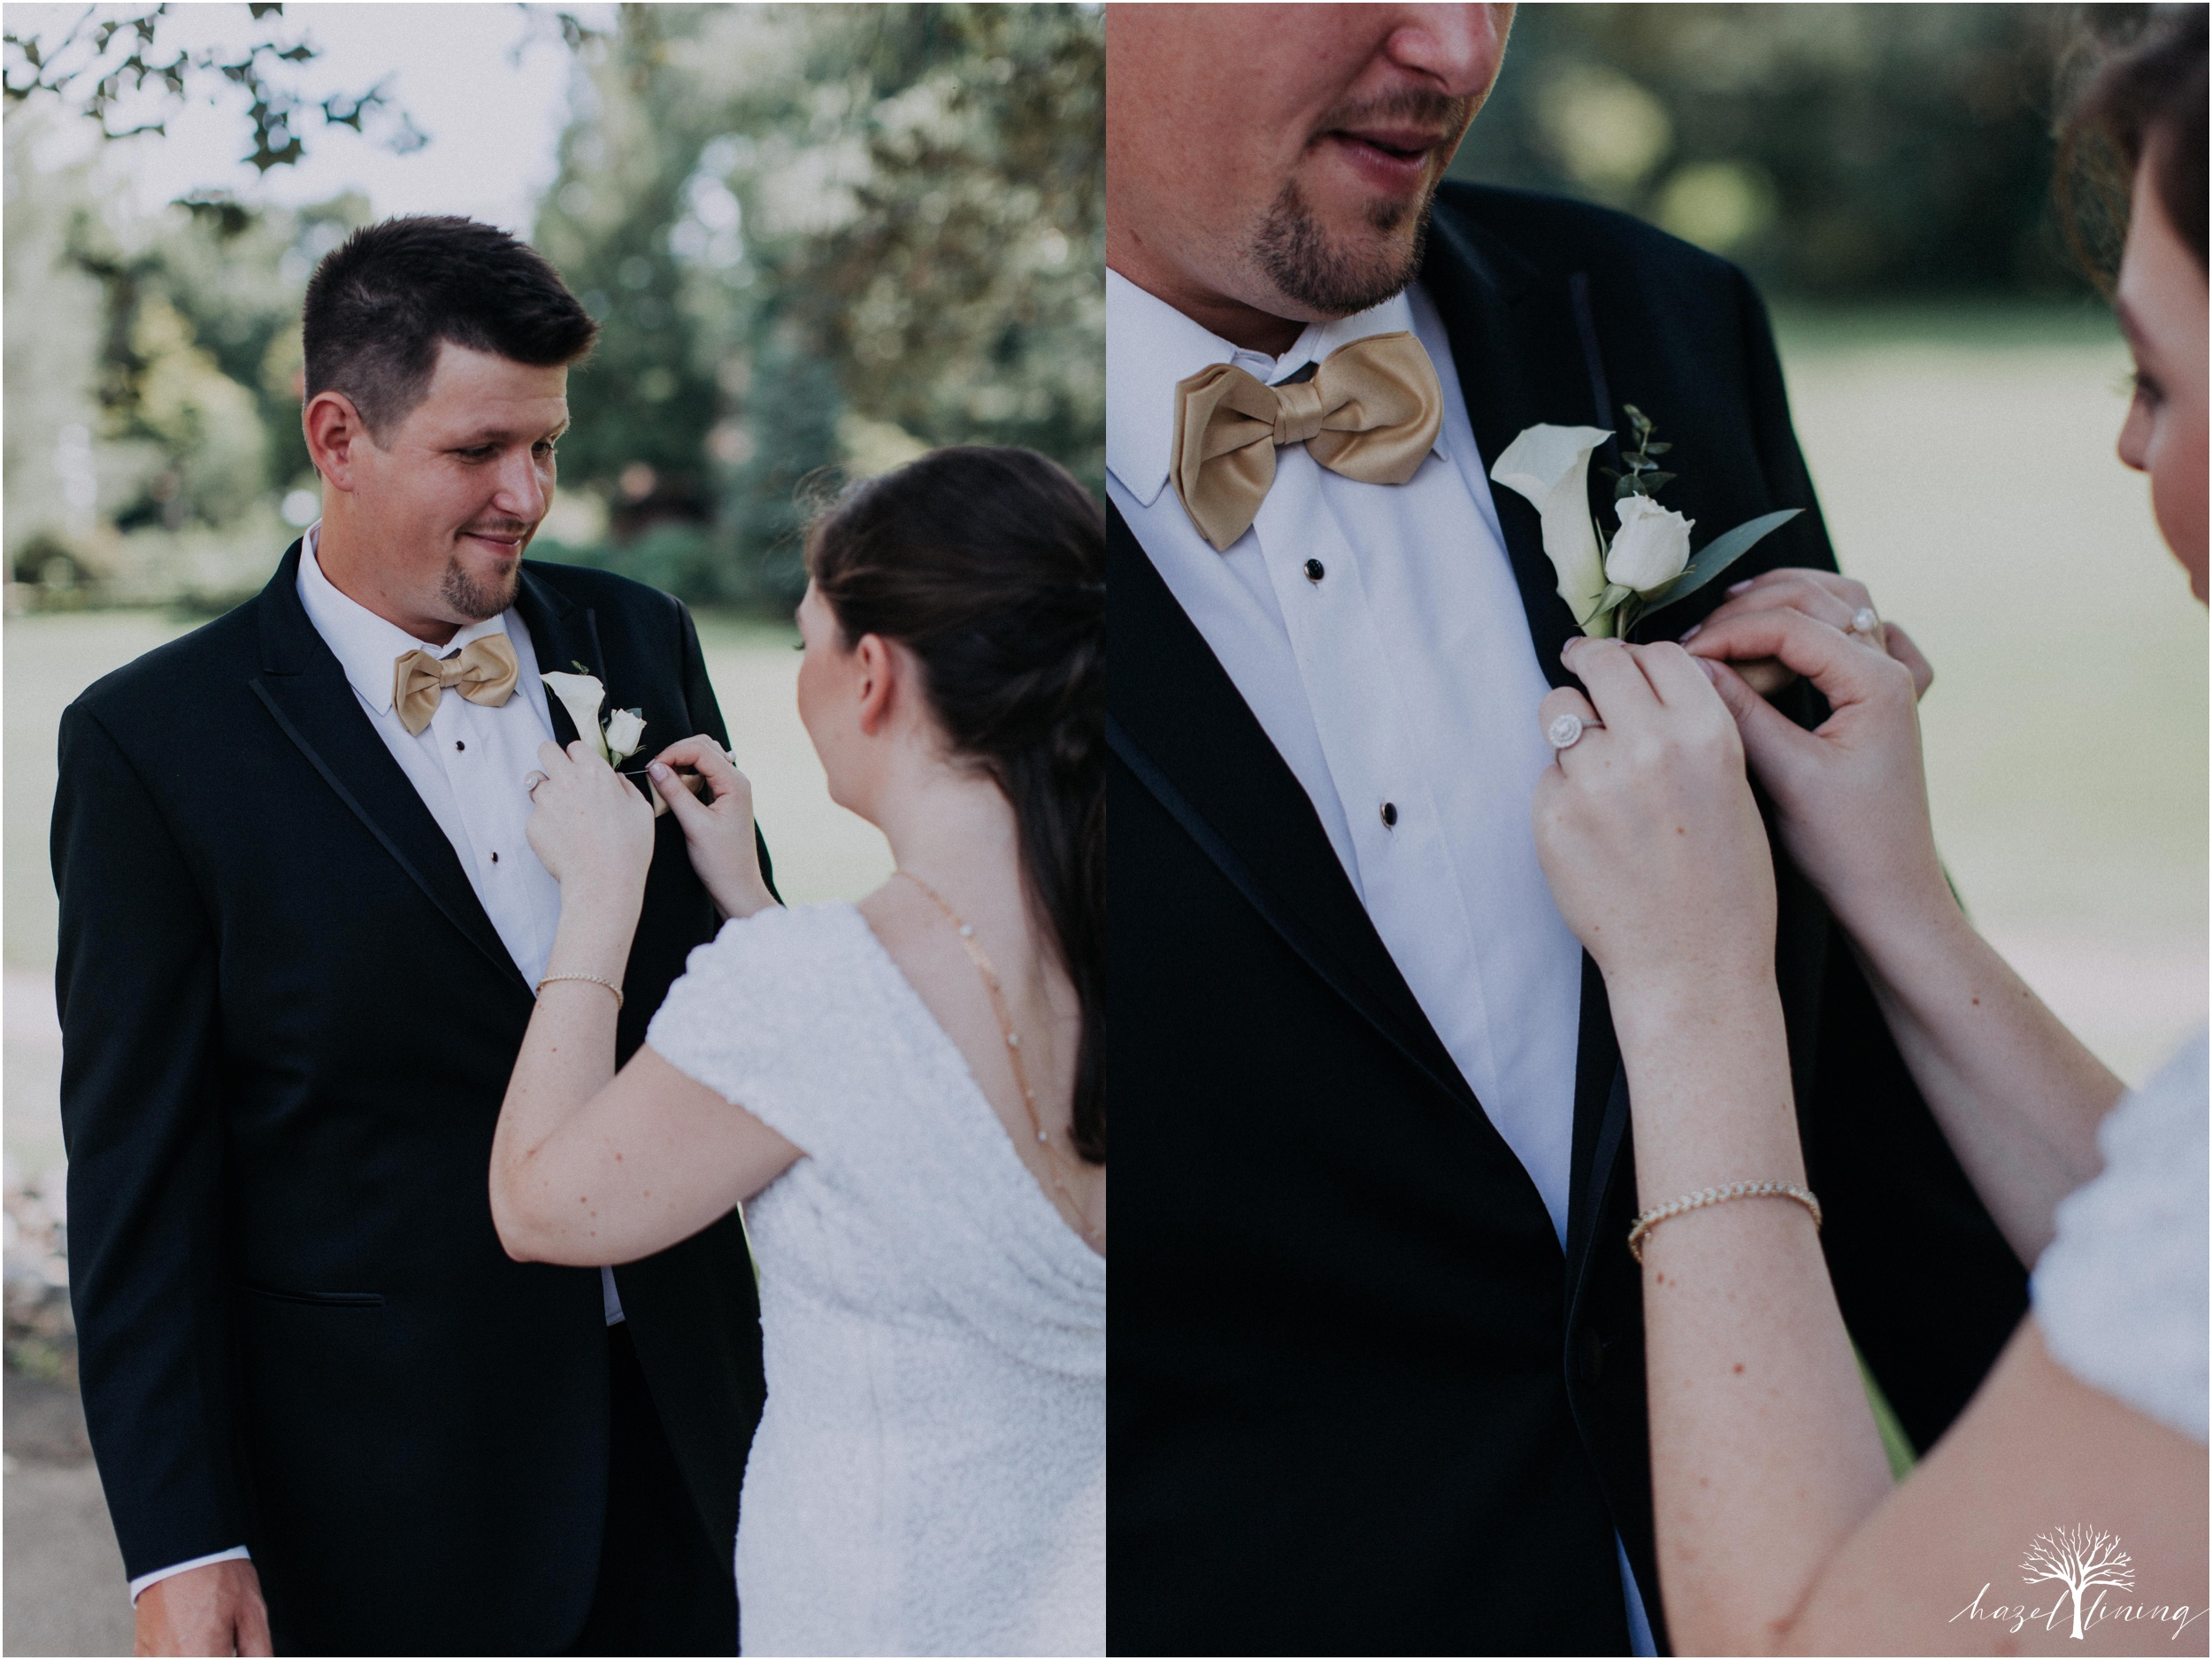 elizabeth-doelp-andrew-foreback-middletown-country-club-summer-langhorne-pennsylvania-wedding-hazel-lining-travel-wedding-elopement-photography_0040.jpg